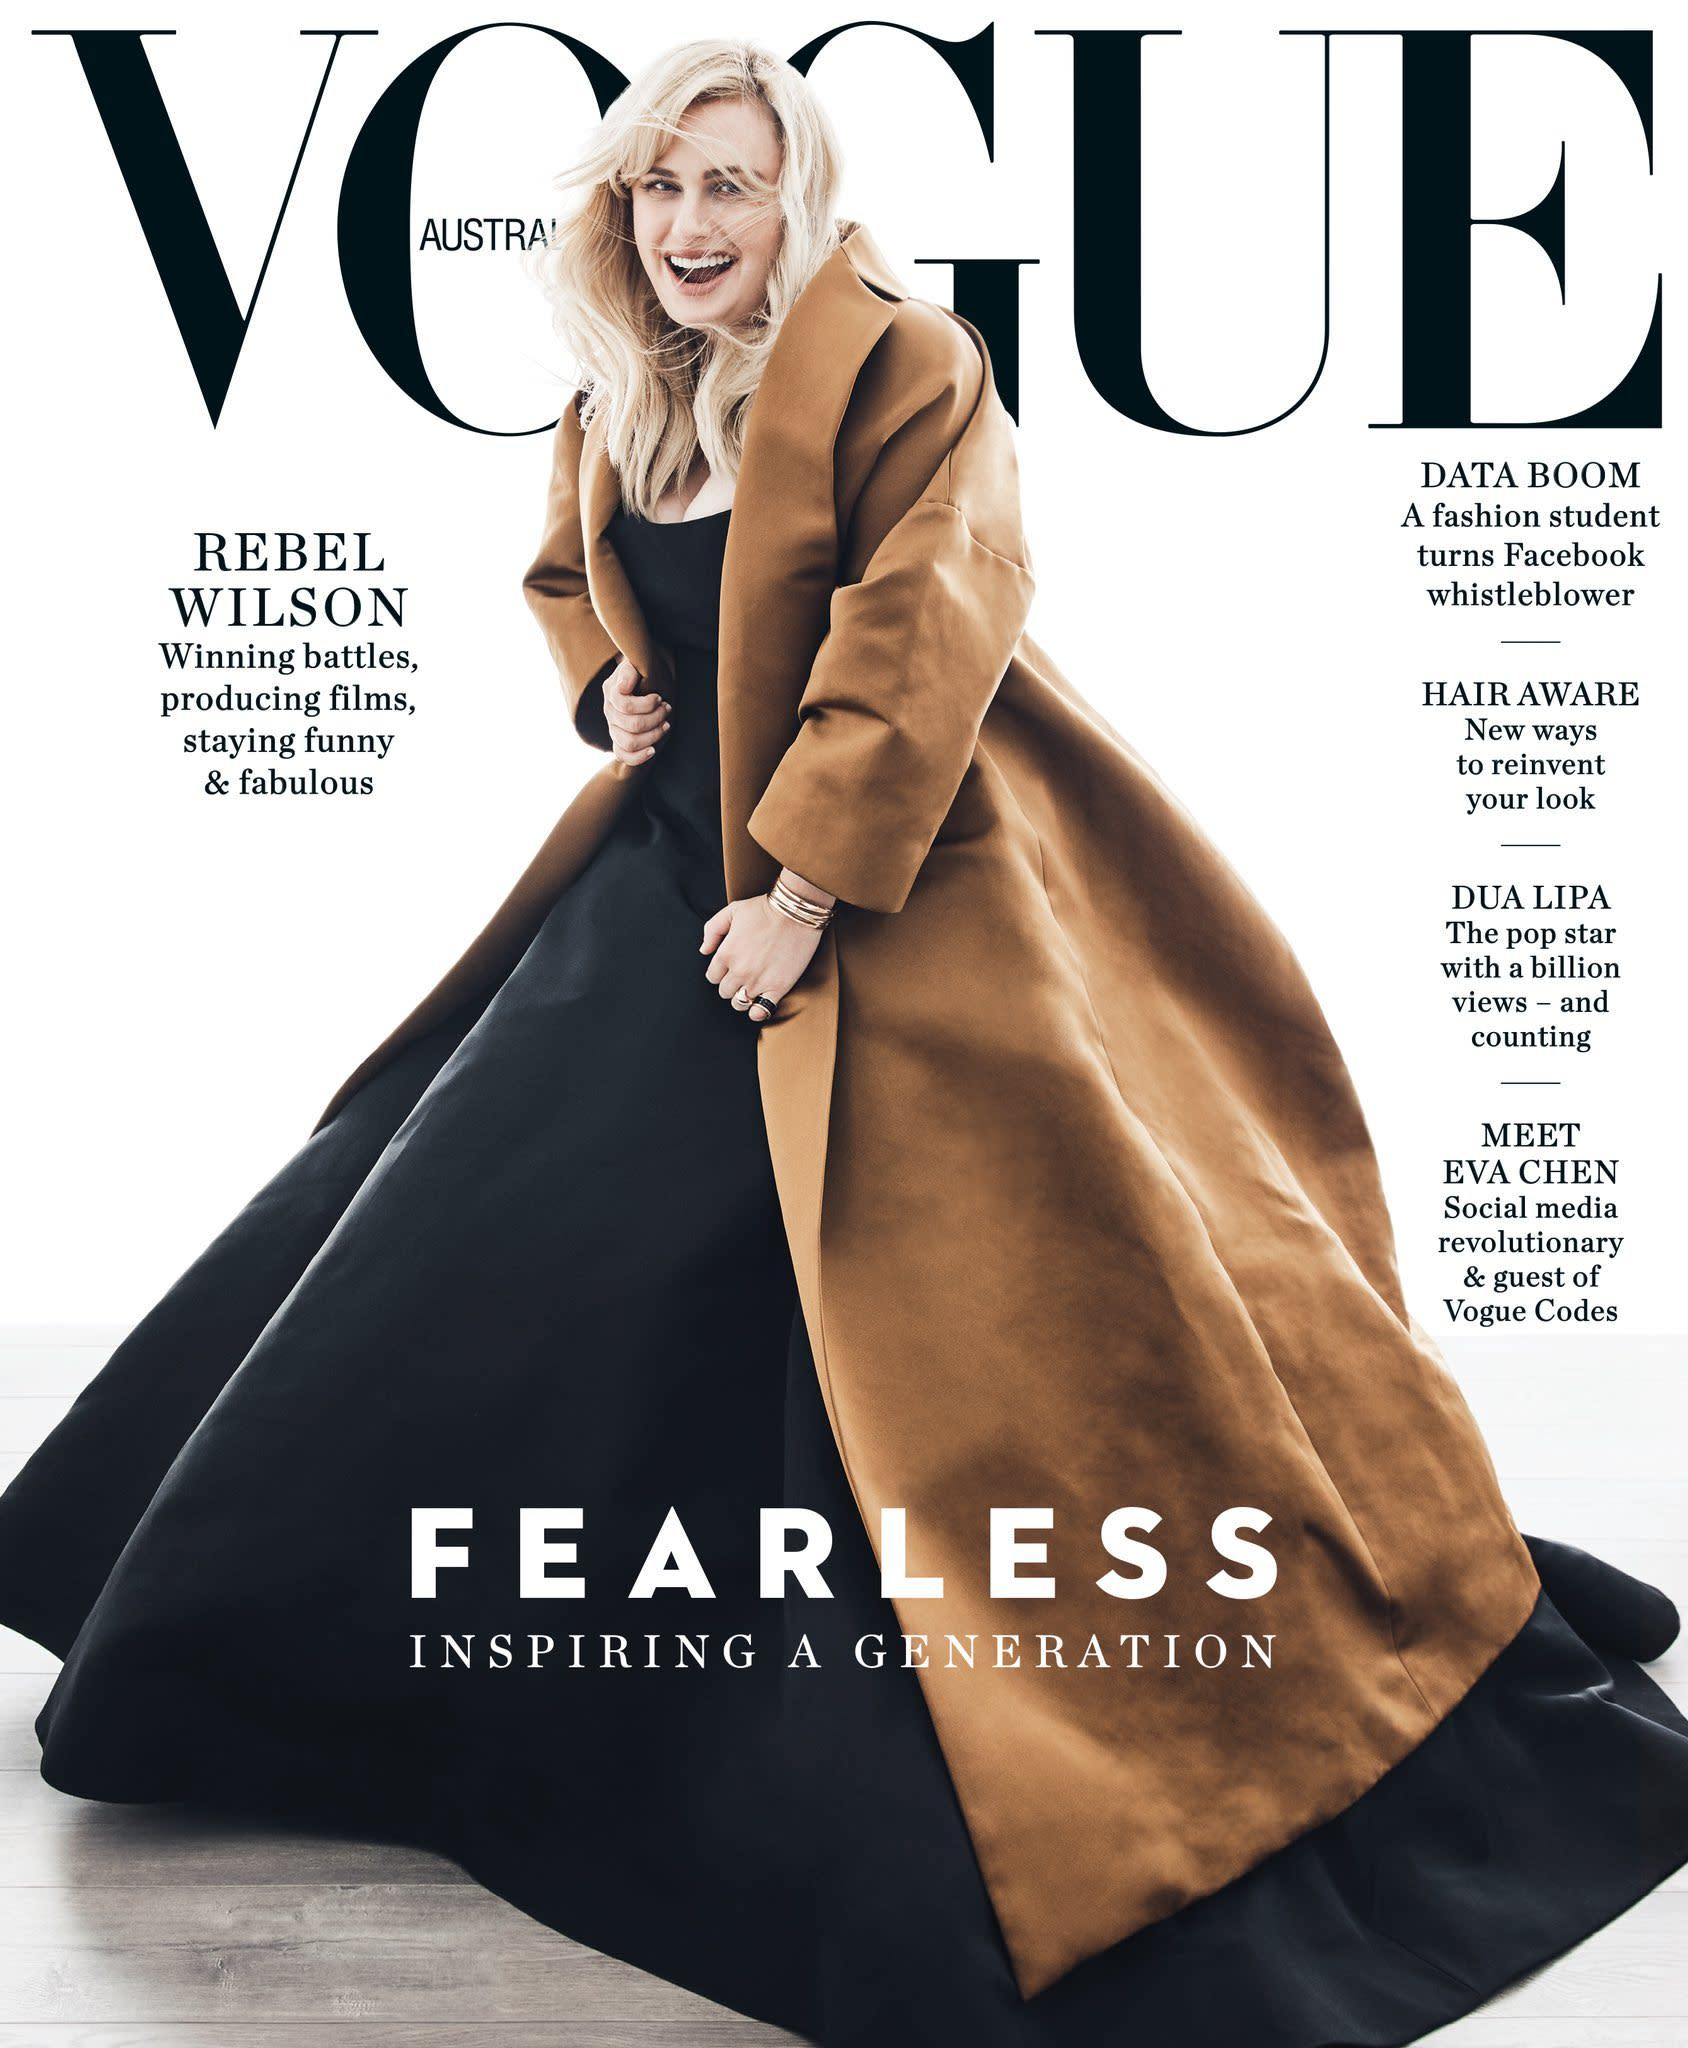 e49b54e32c0 Rebel Wilson graces the cover of Vogue Australia s June issue. (Photo   Nicole Bentley for Vogue Australia)